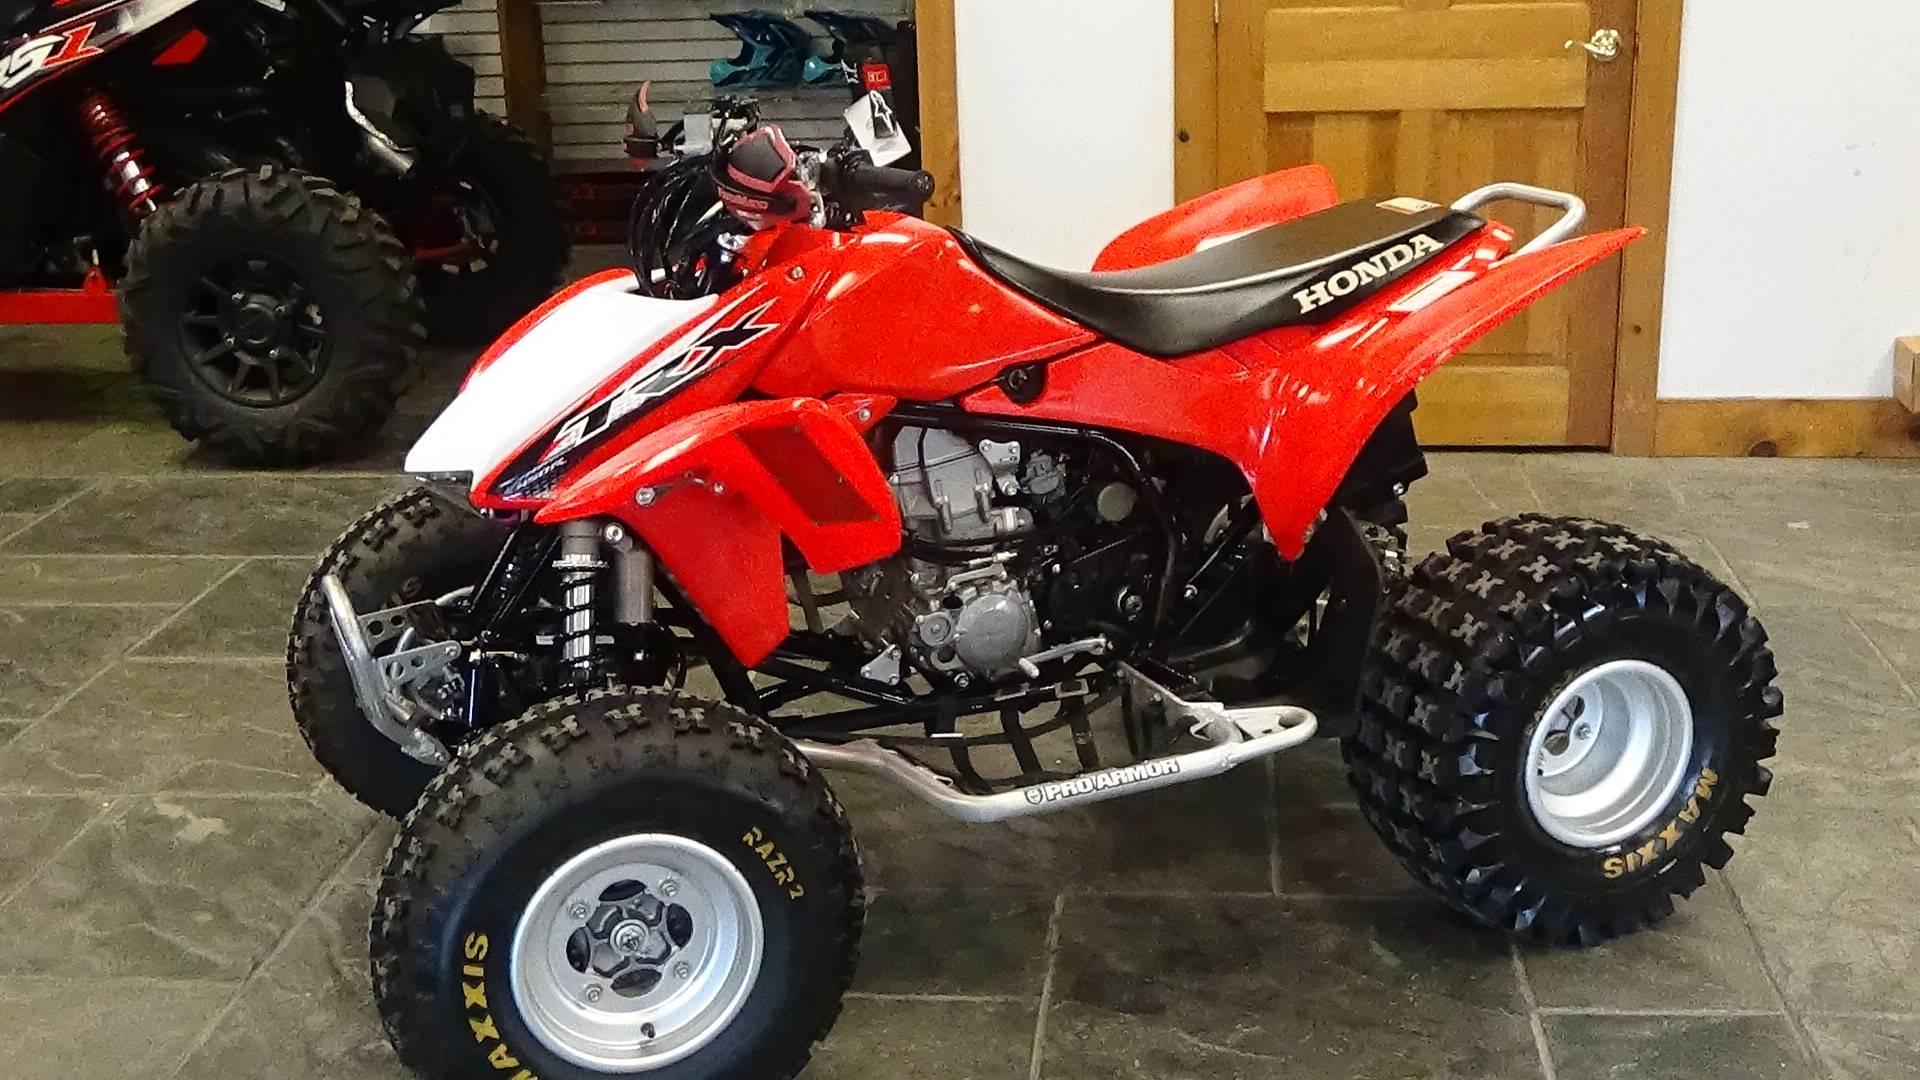 Used 2014 Honda TRX®450R ATVs in Adams, MA | Stock Number